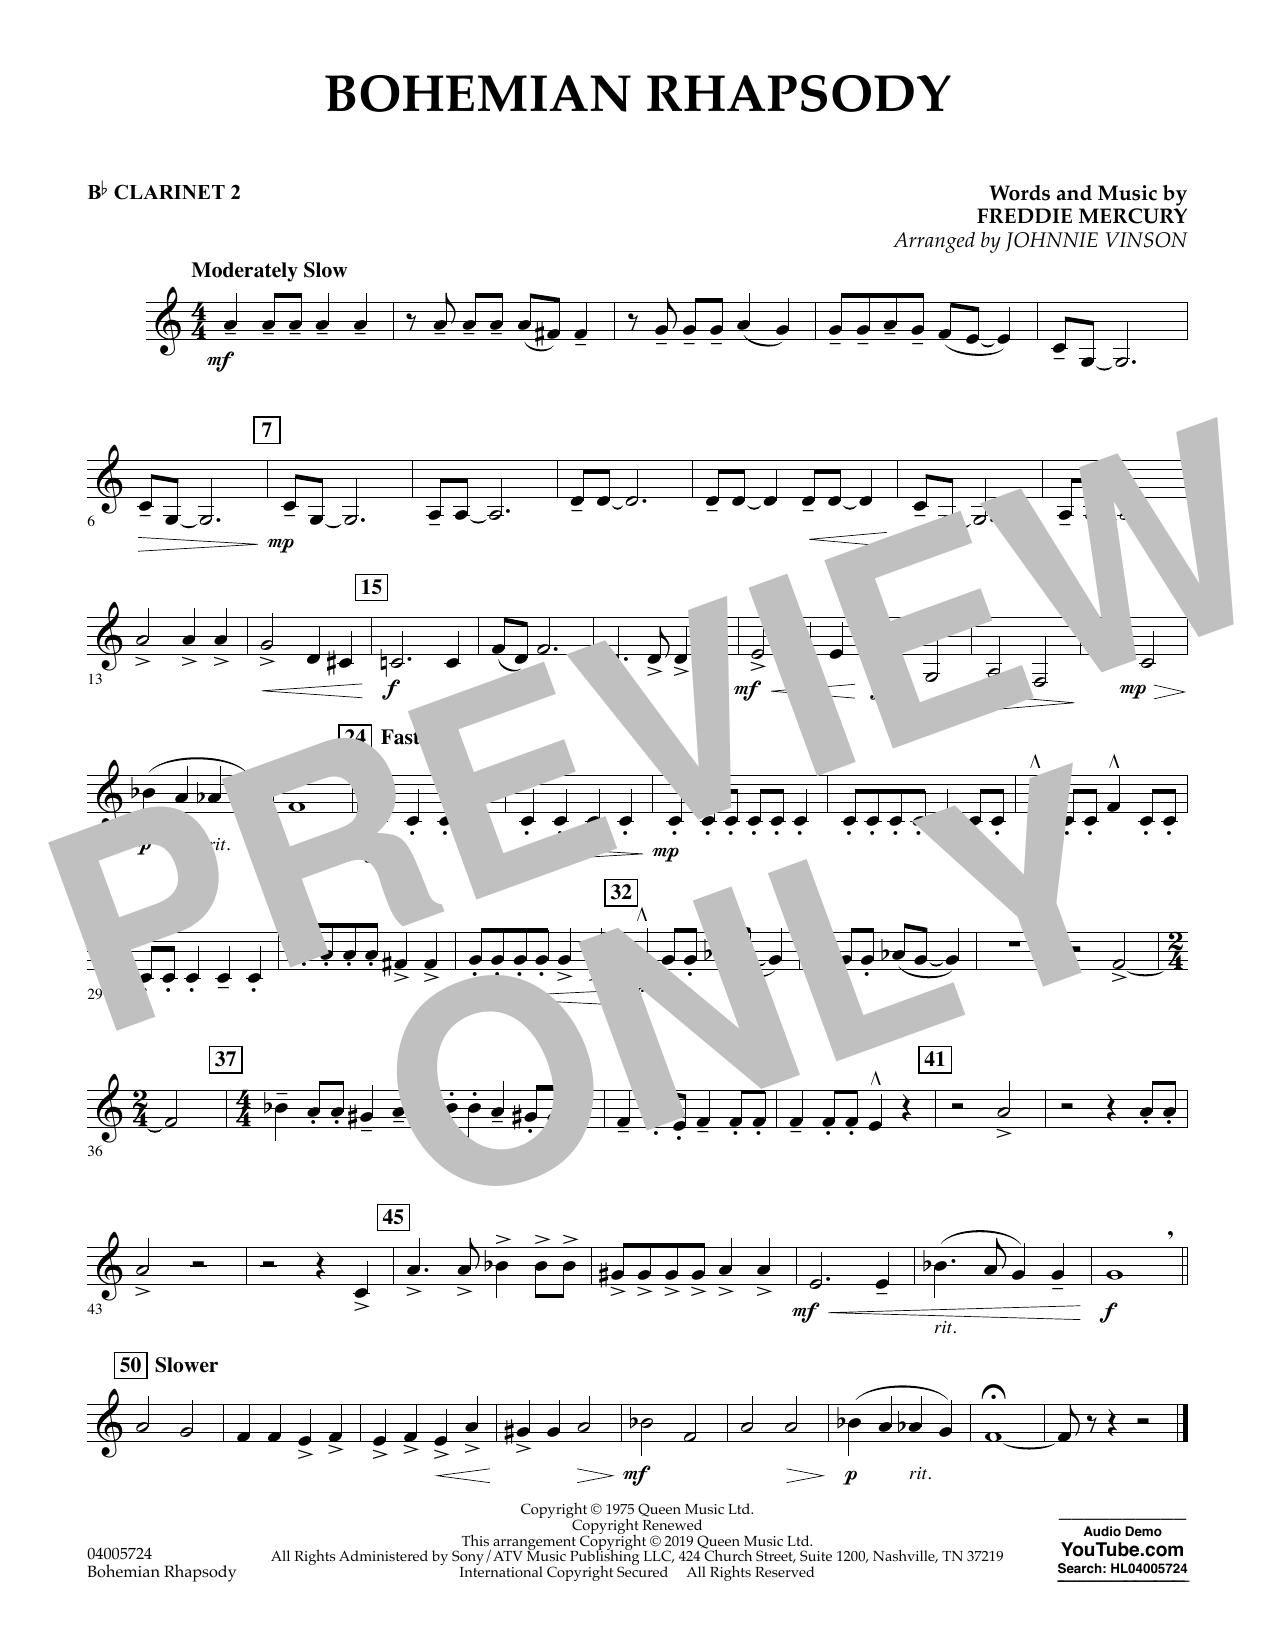 Bohemian Rhapsody (arr. Johnnie Vinson) - Bb Clarinet 2 (Concert Band)